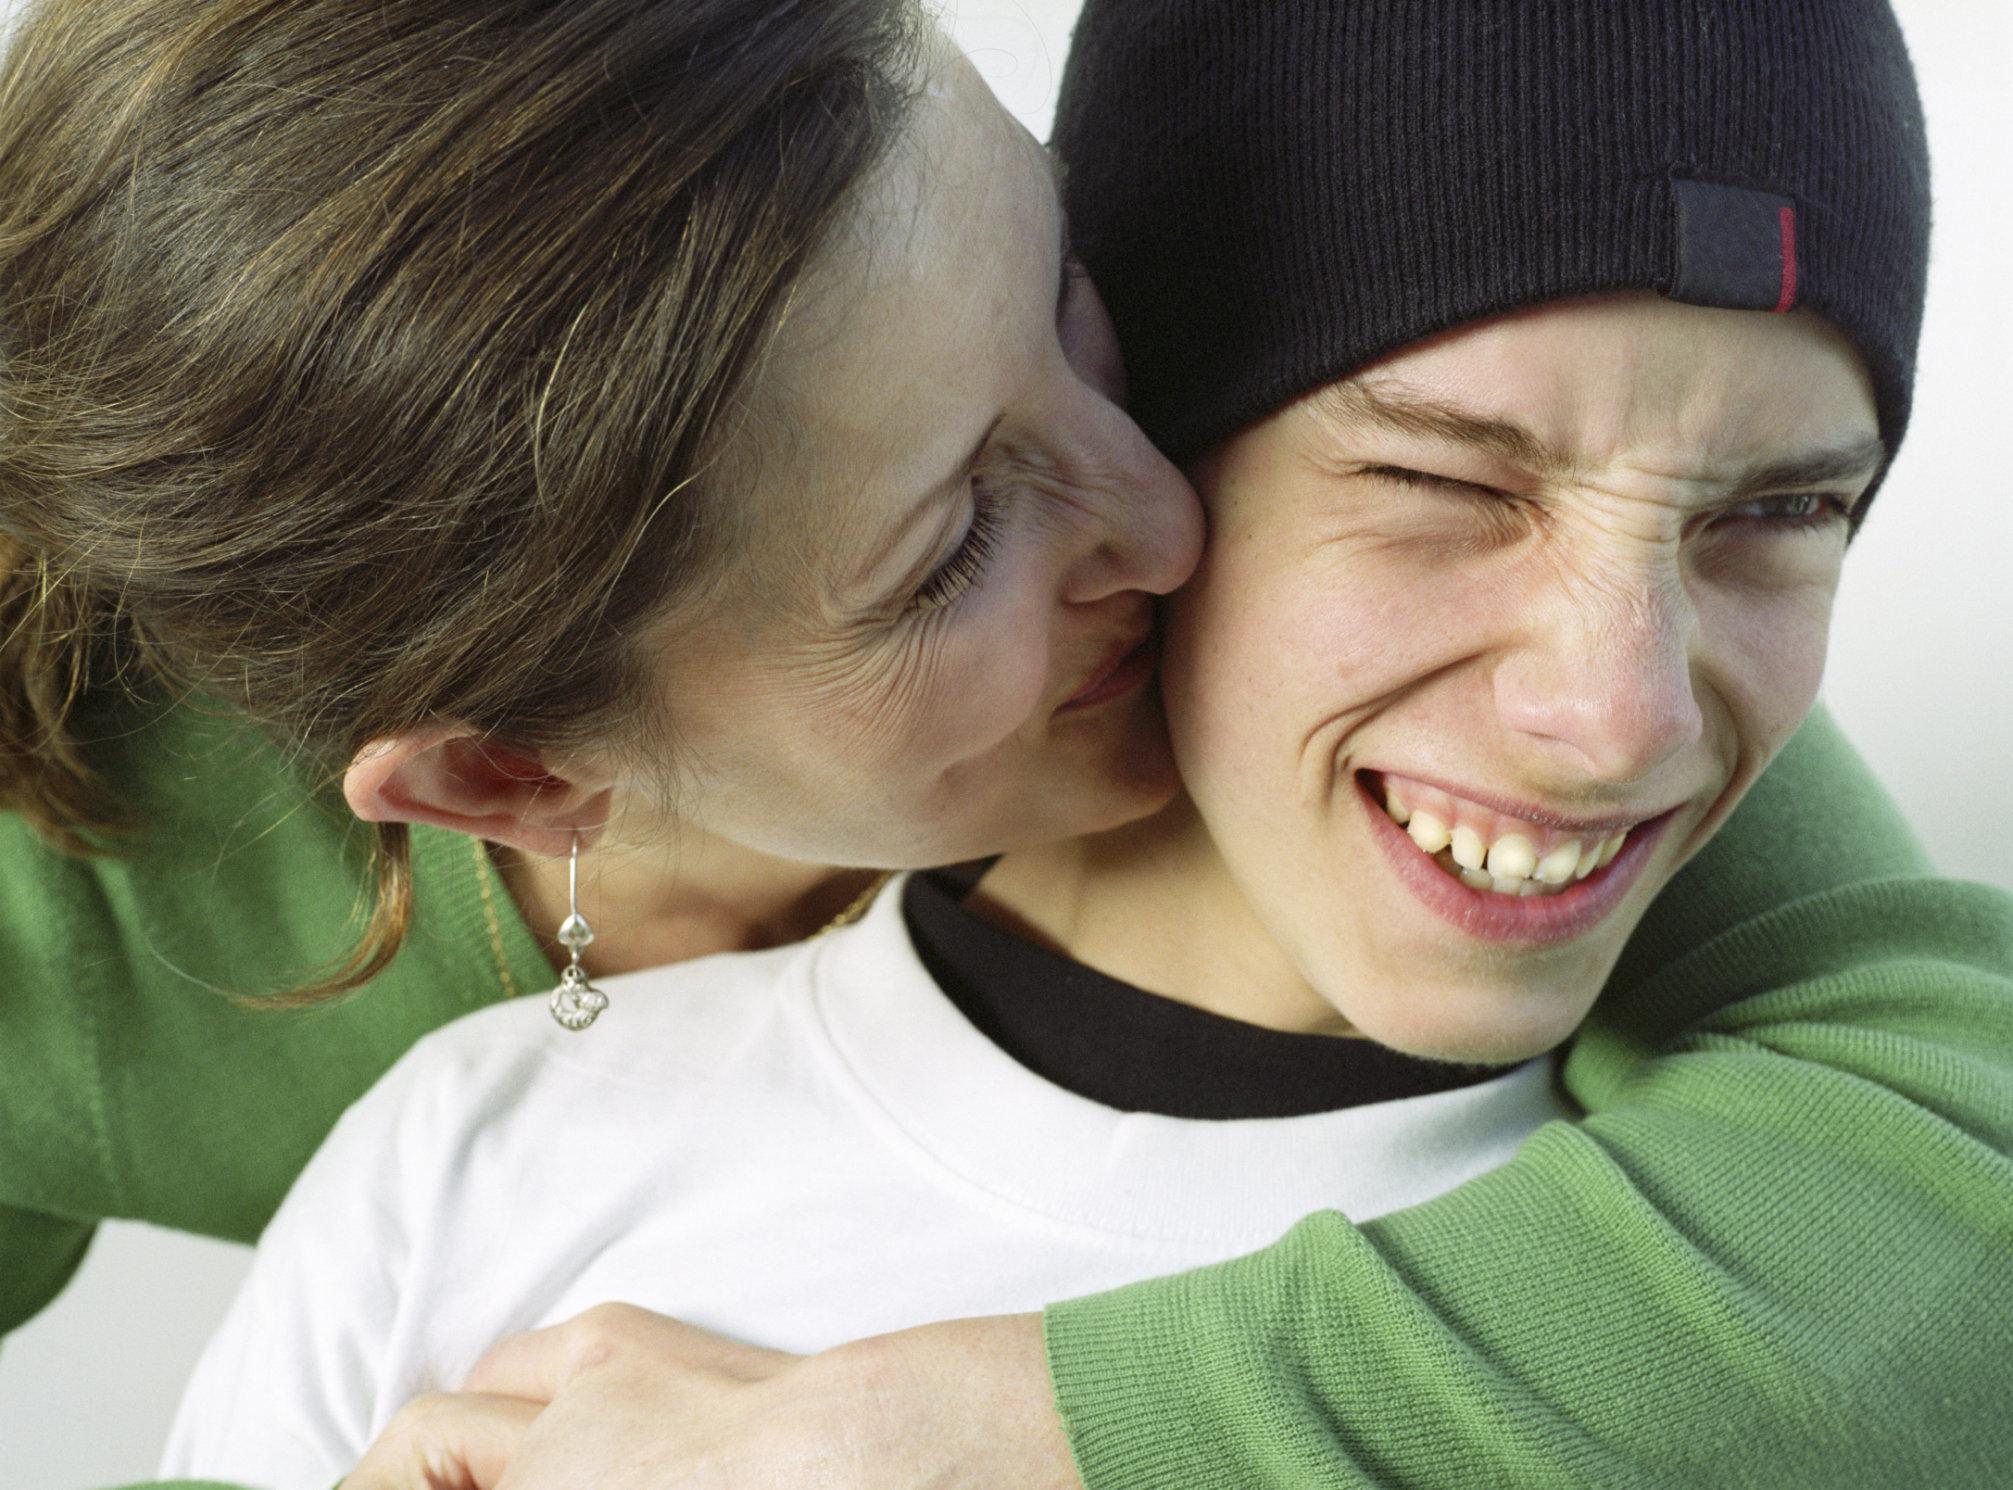 Parents sex talk with boys